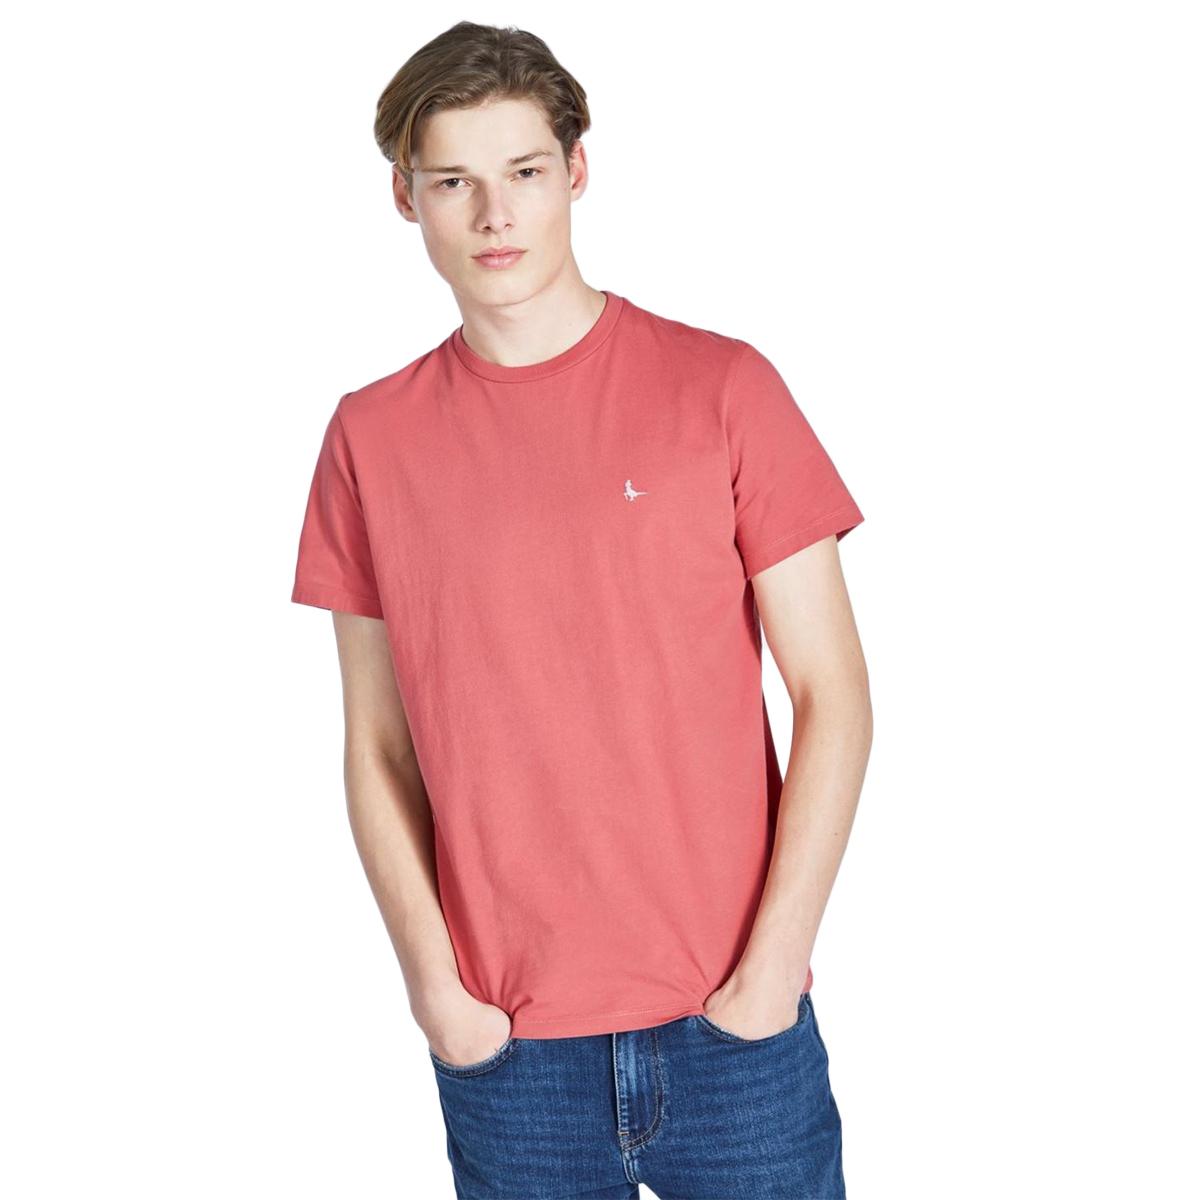 Jack Wills Men's Sandleford Short-Sleeve Tee - Brown, S